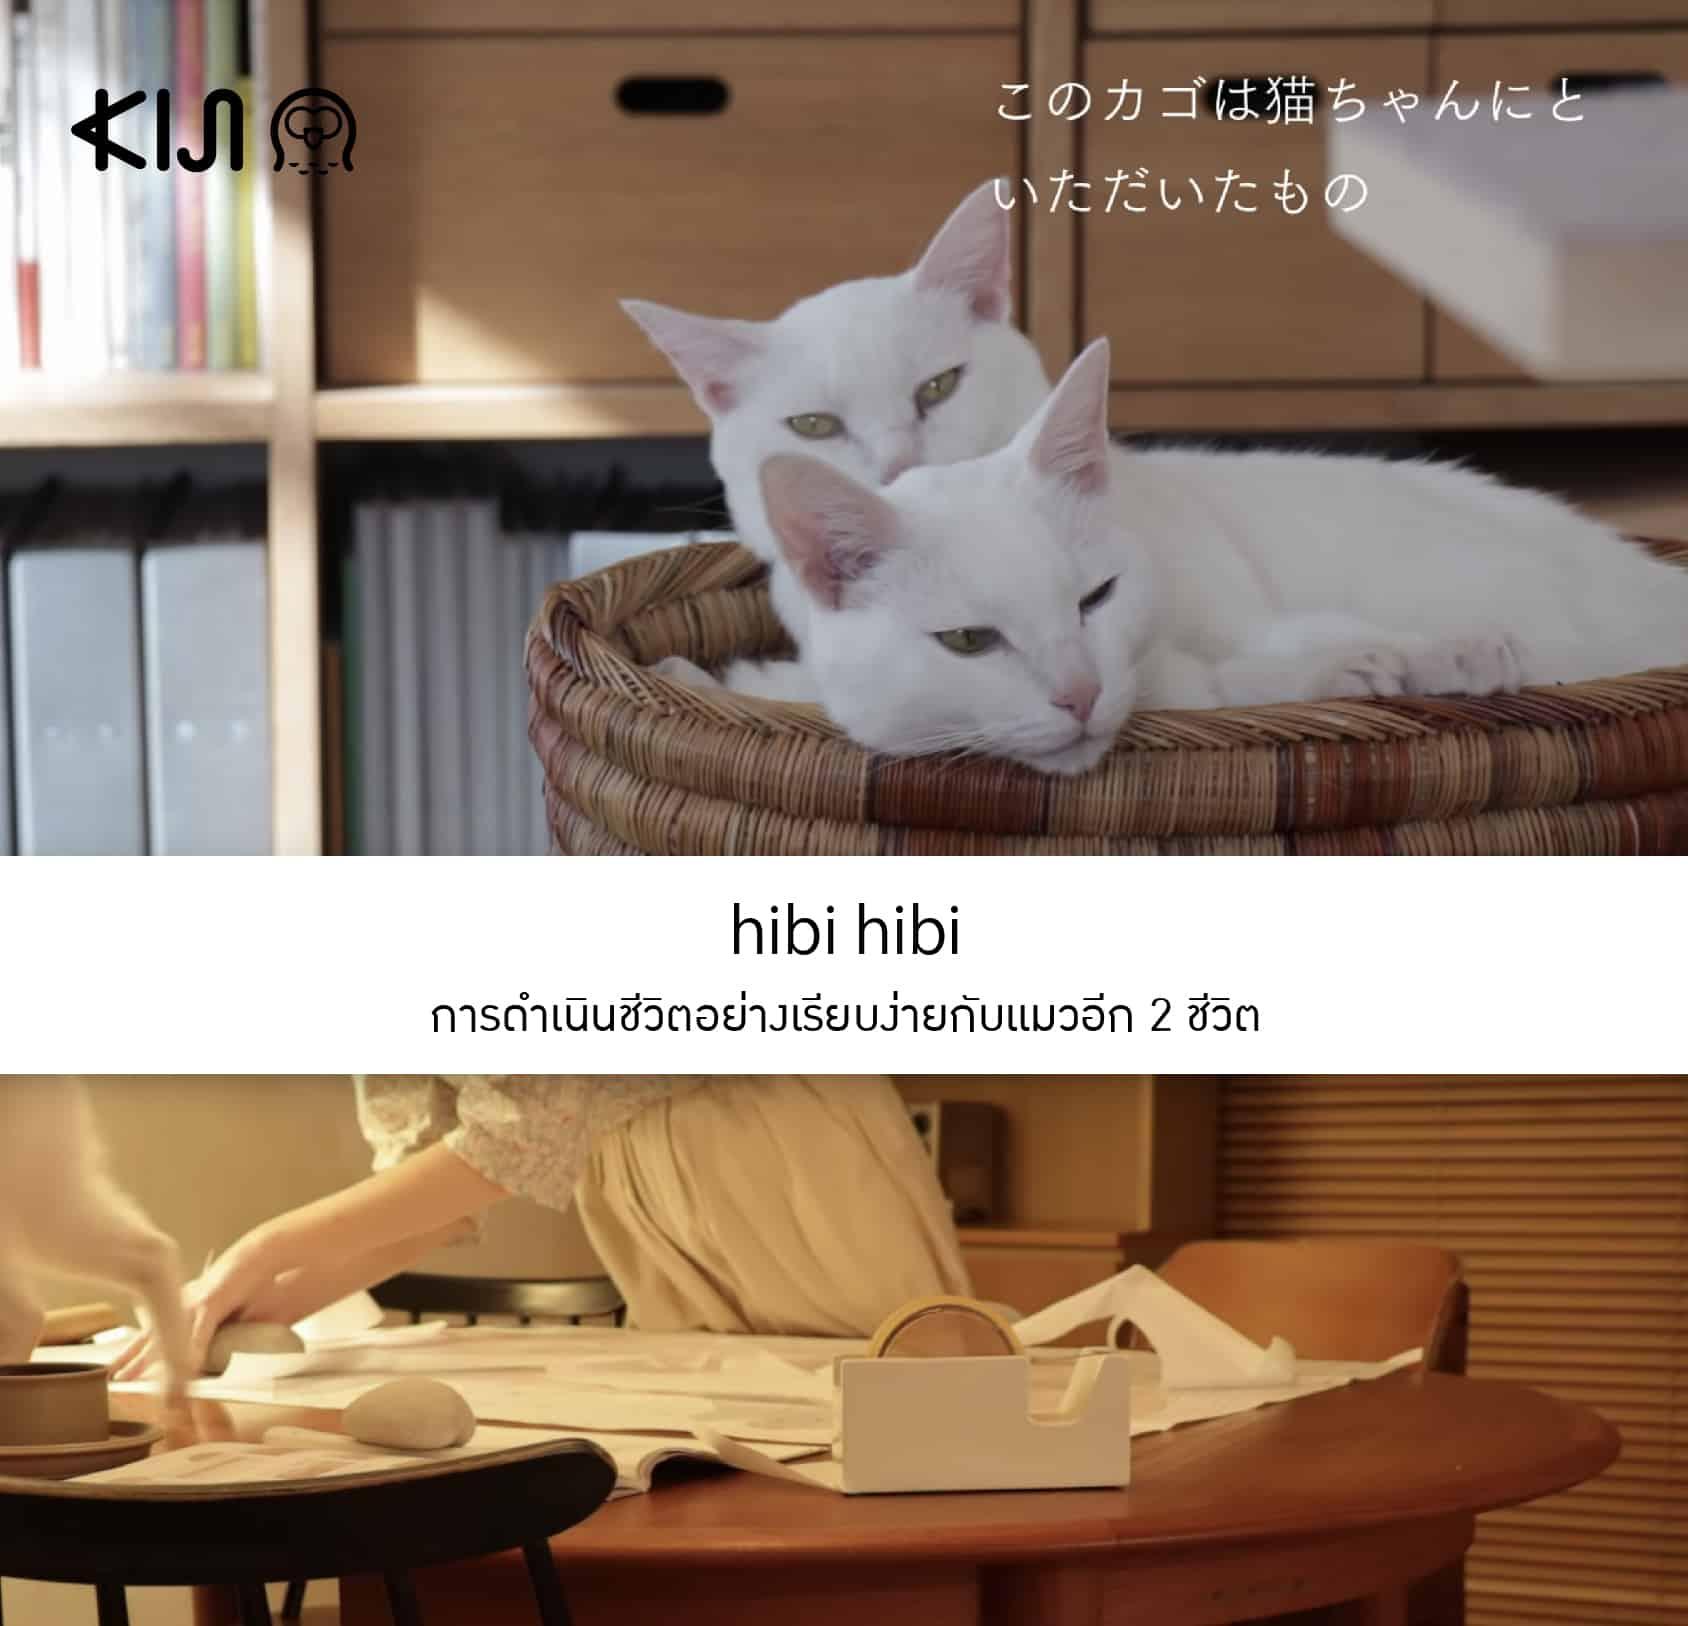 hibi hibi ยูทูปเบอร์ญี่ปุ่น ที่นำเสนอการดำเนินชีวิตอย่างเรียบง่ายกับแมวอีก 2 ชีวิต